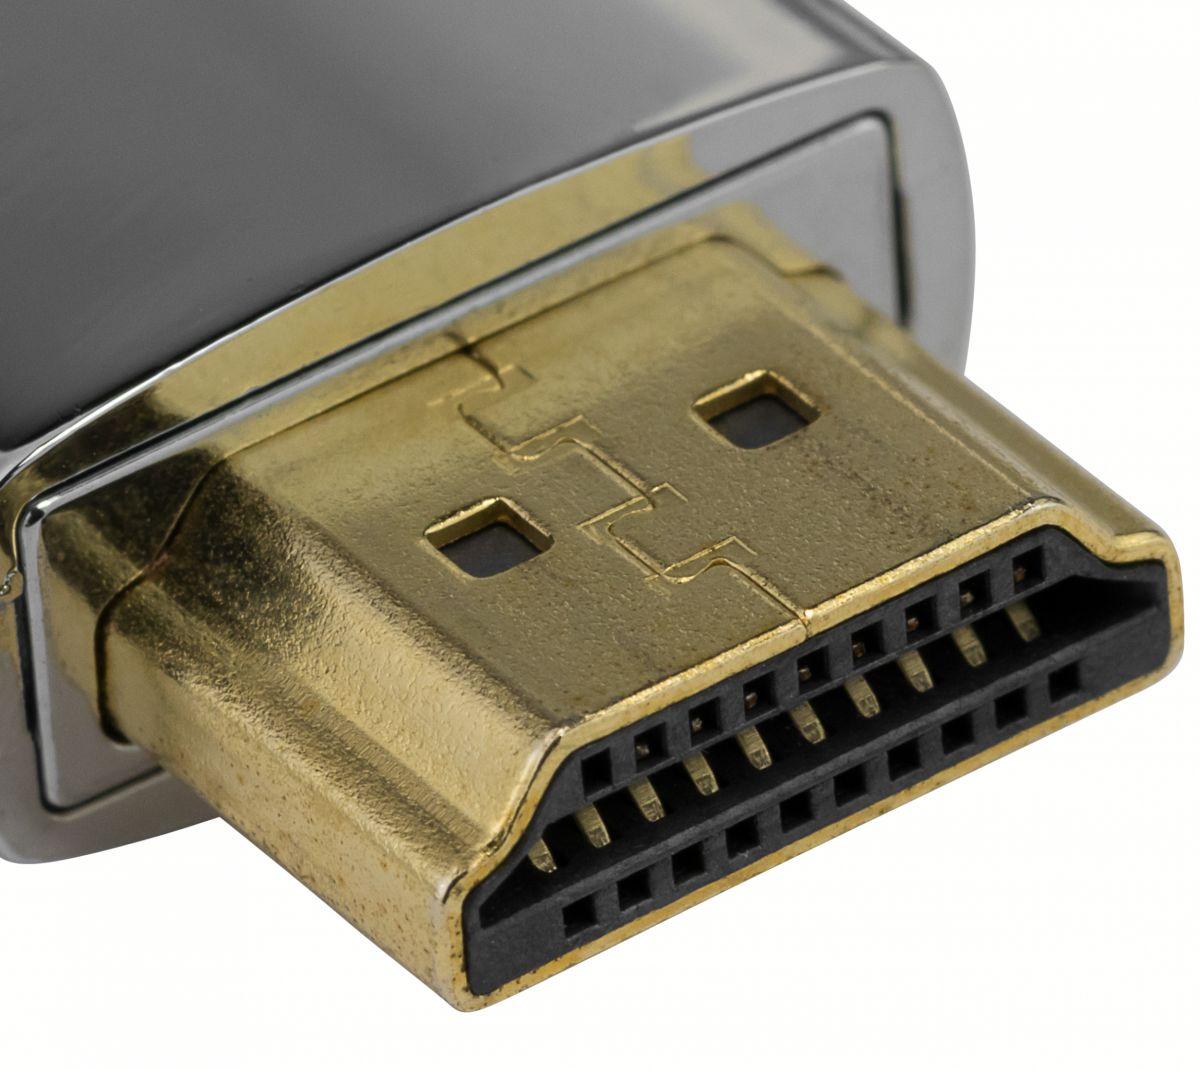 mumbi ultrathin hdmi kabel 2 0 ultra hd 4k 3d hdr uhd high. Black Bedroom Furniture Sets. Home Design Ideas